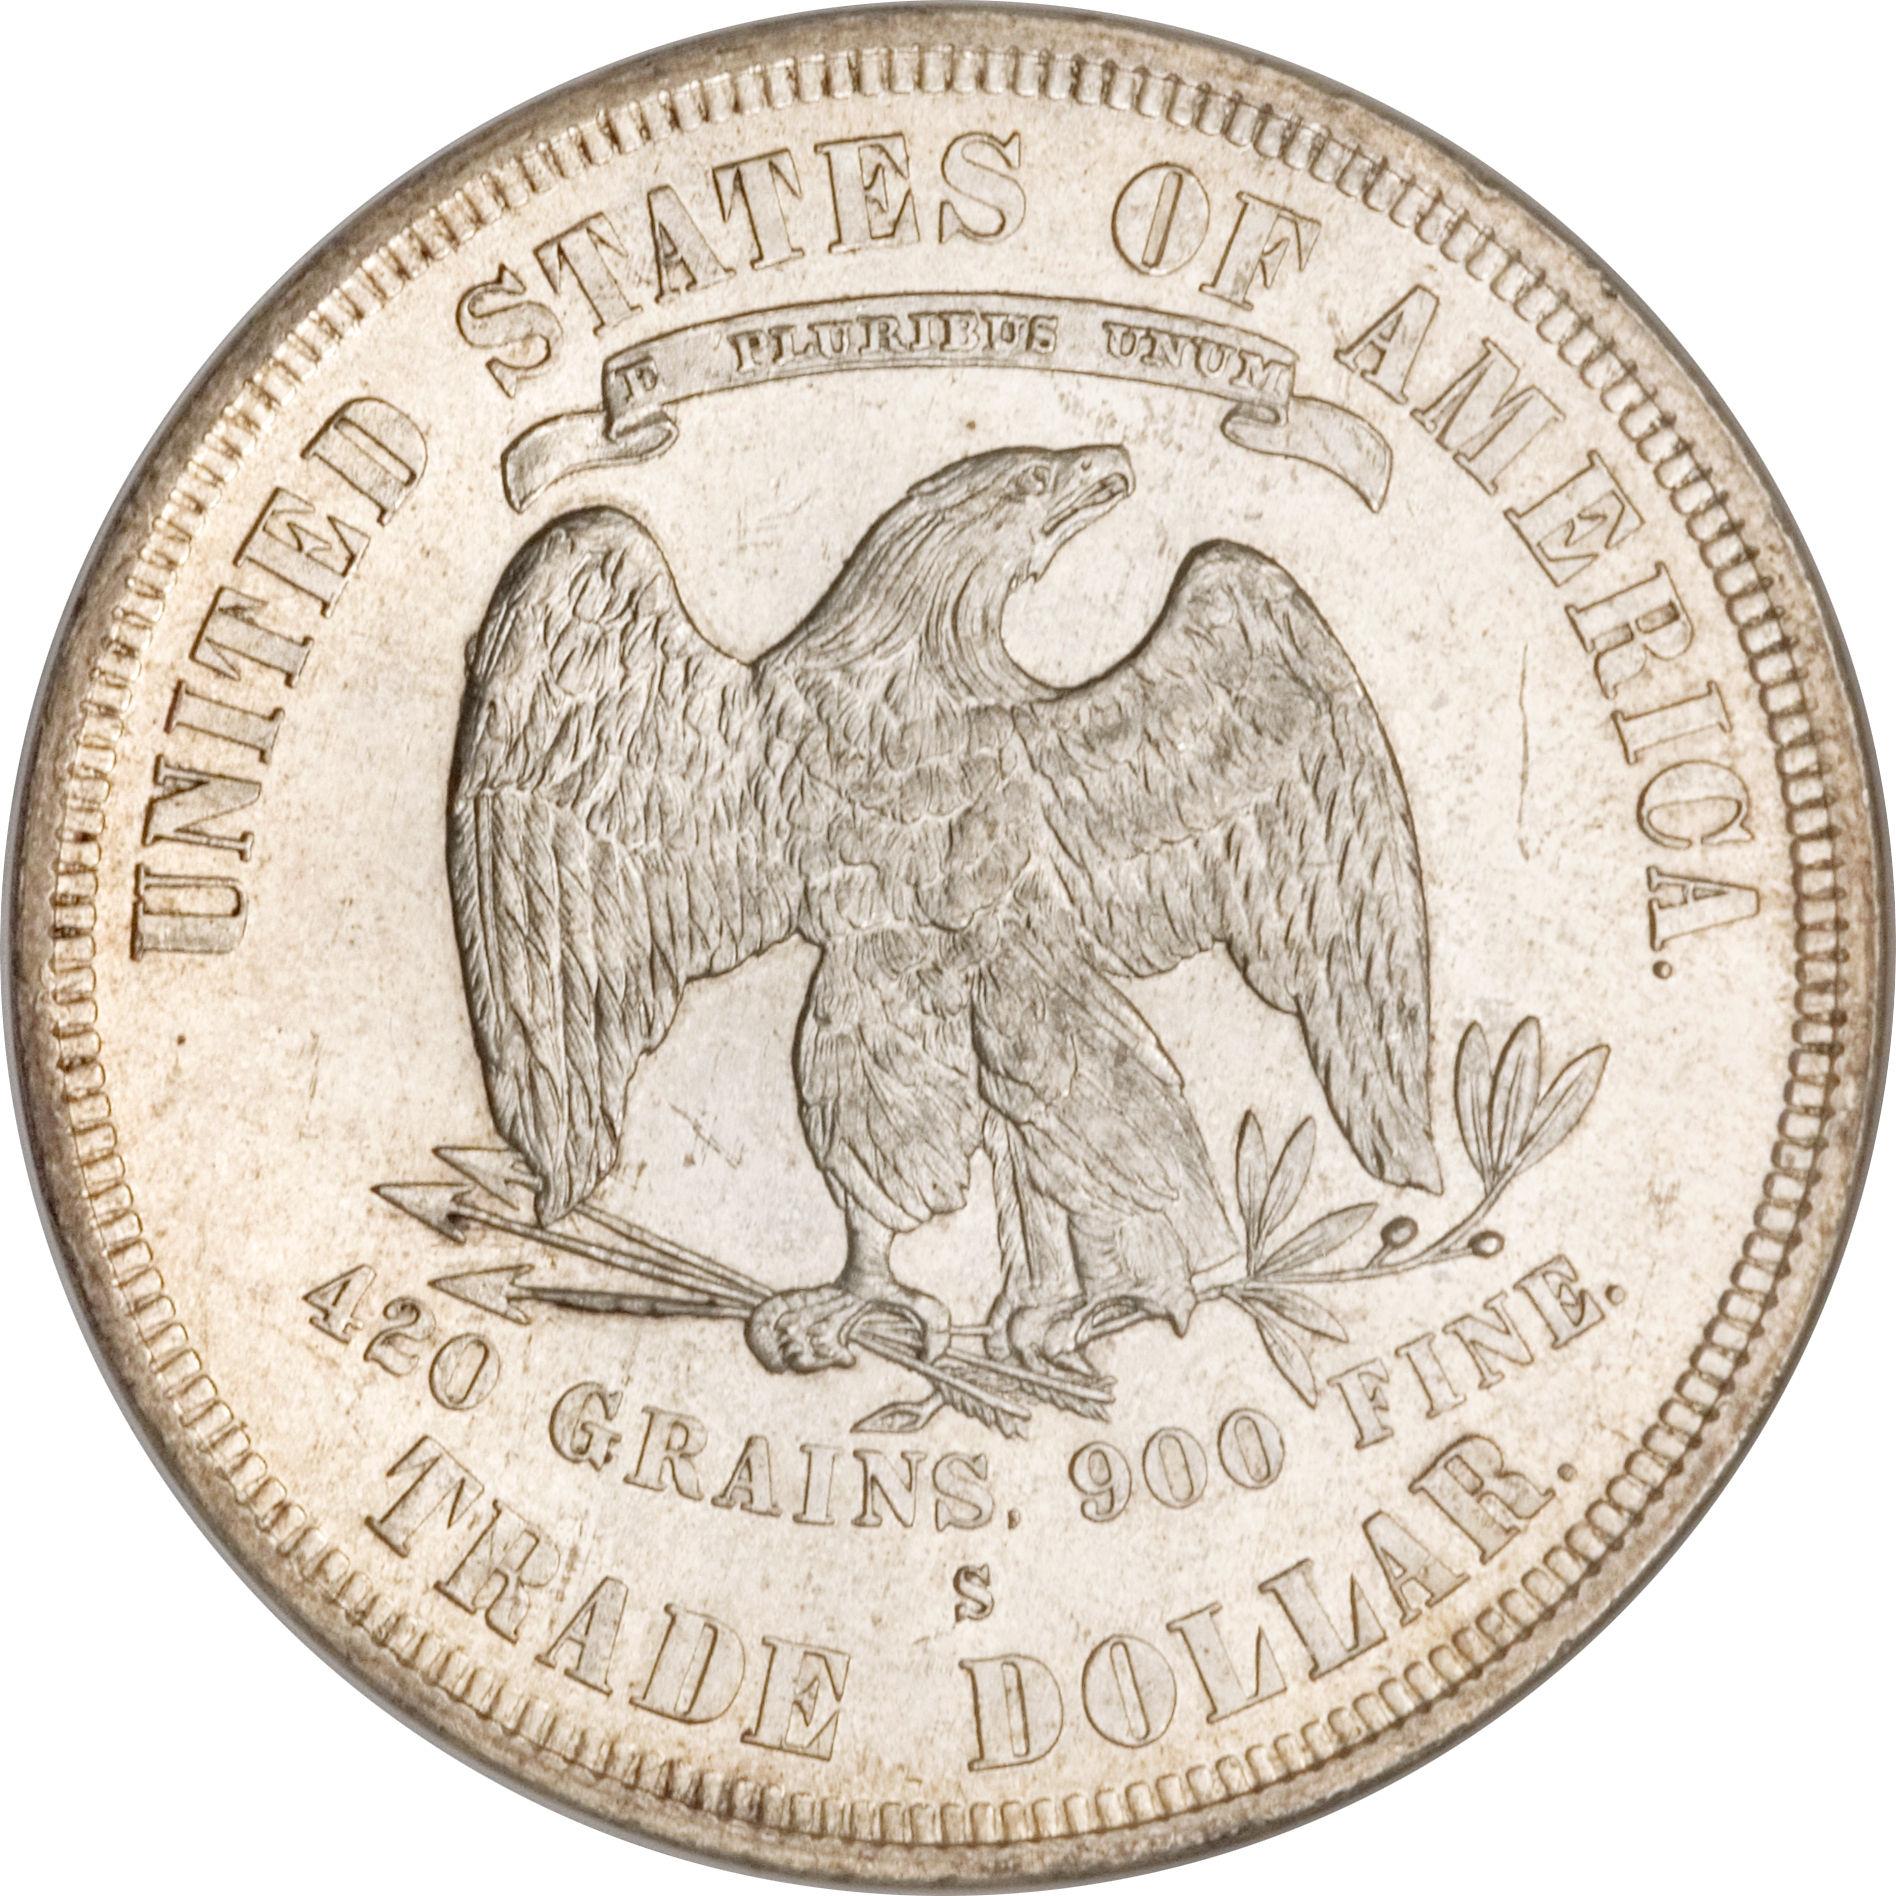 1 Dollar Quot Trade Dollar Quot 201 Tats Unis Numista